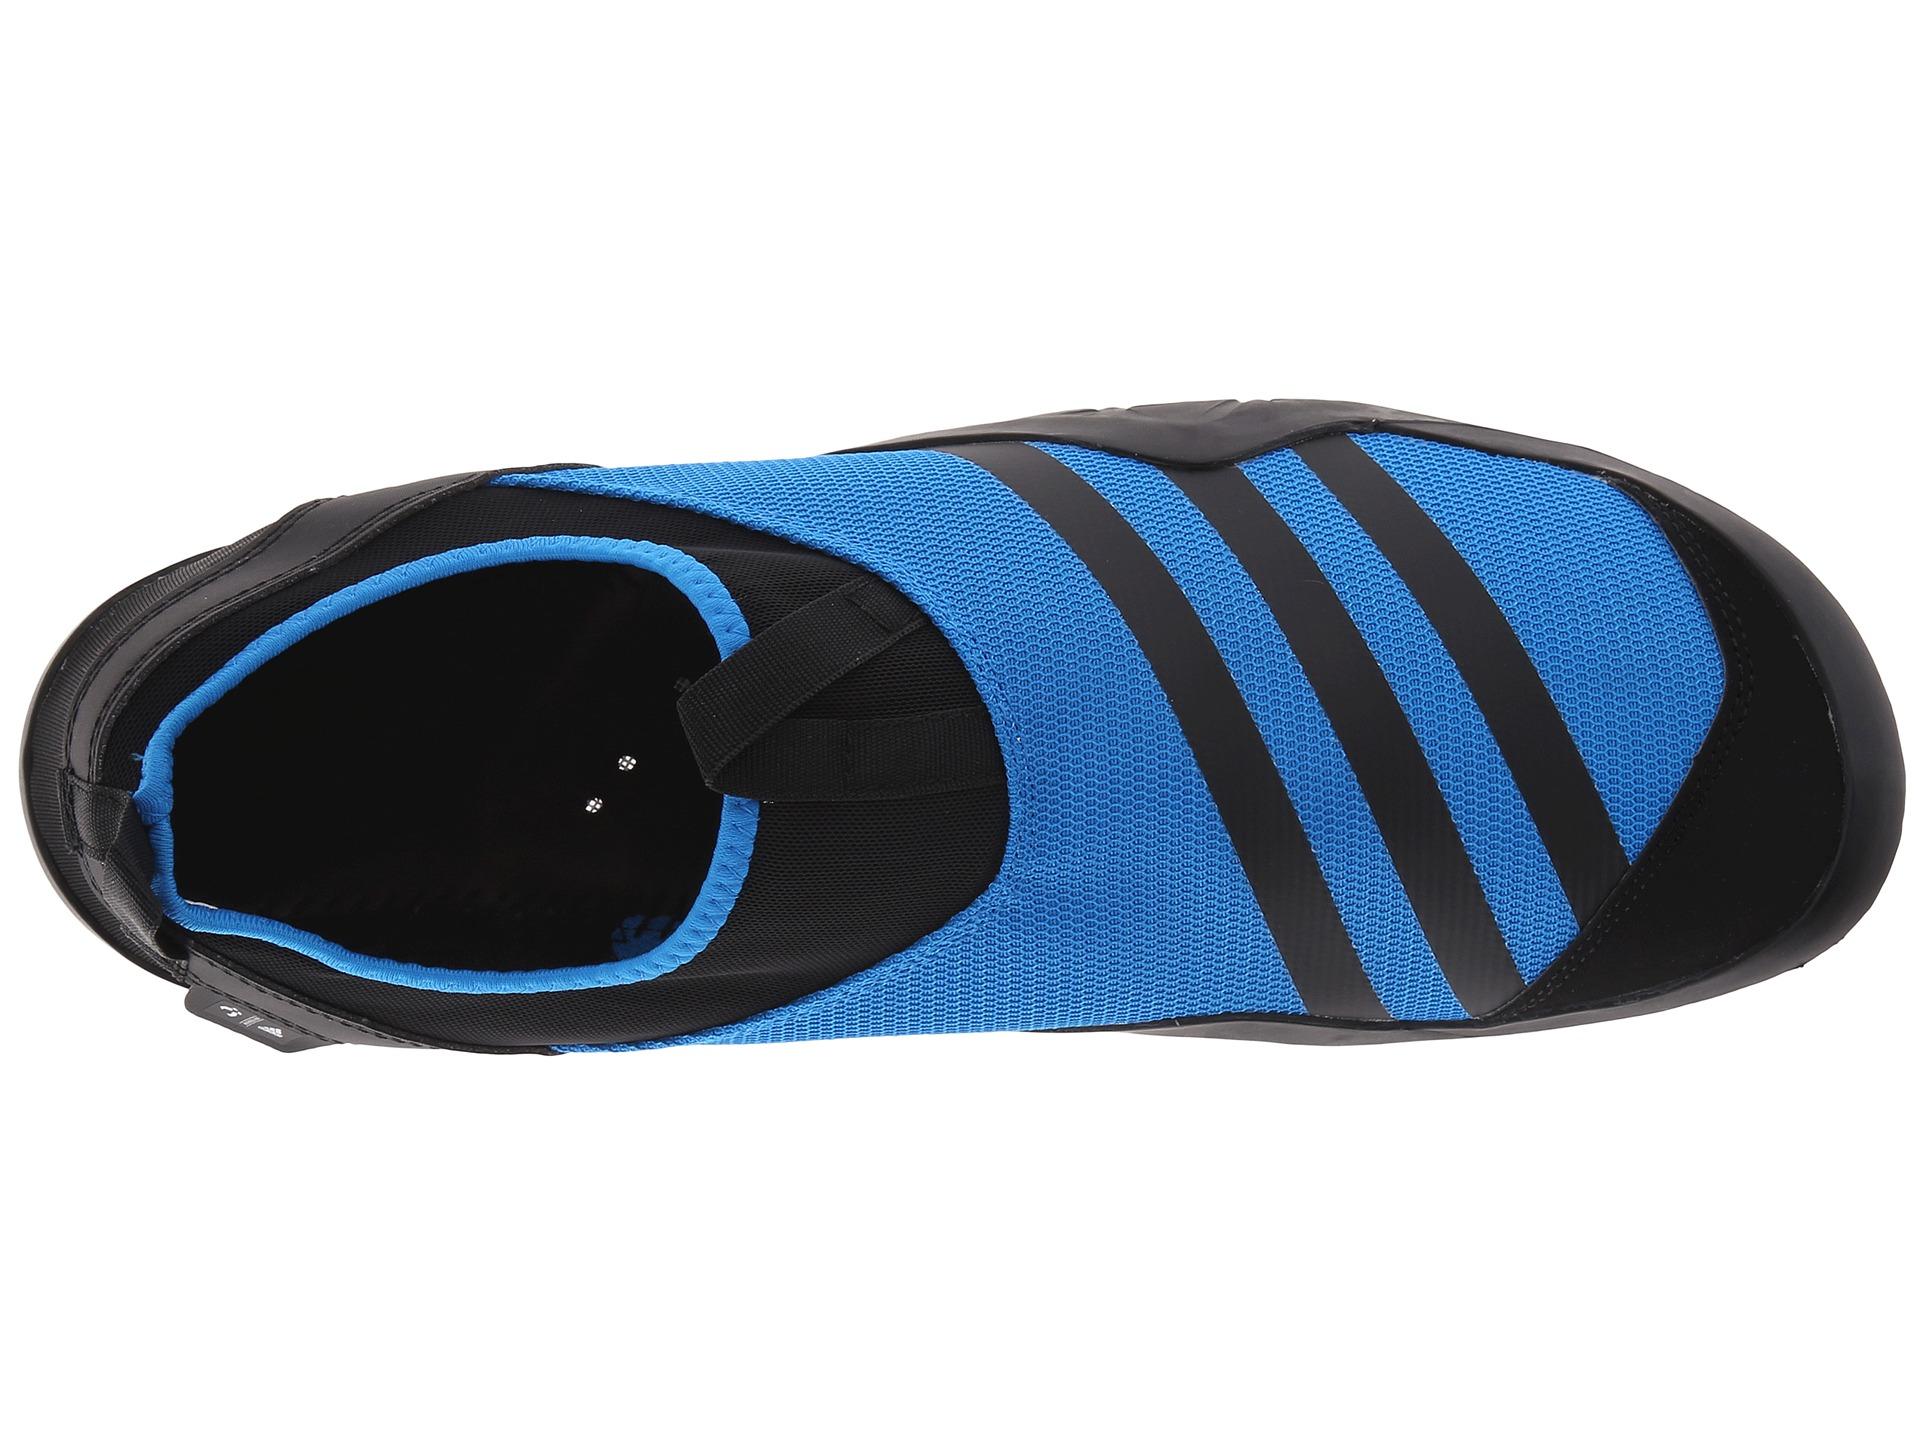 classic fit 7d651 75779 Men's Blue Climacool® Jawpaw Slip-on